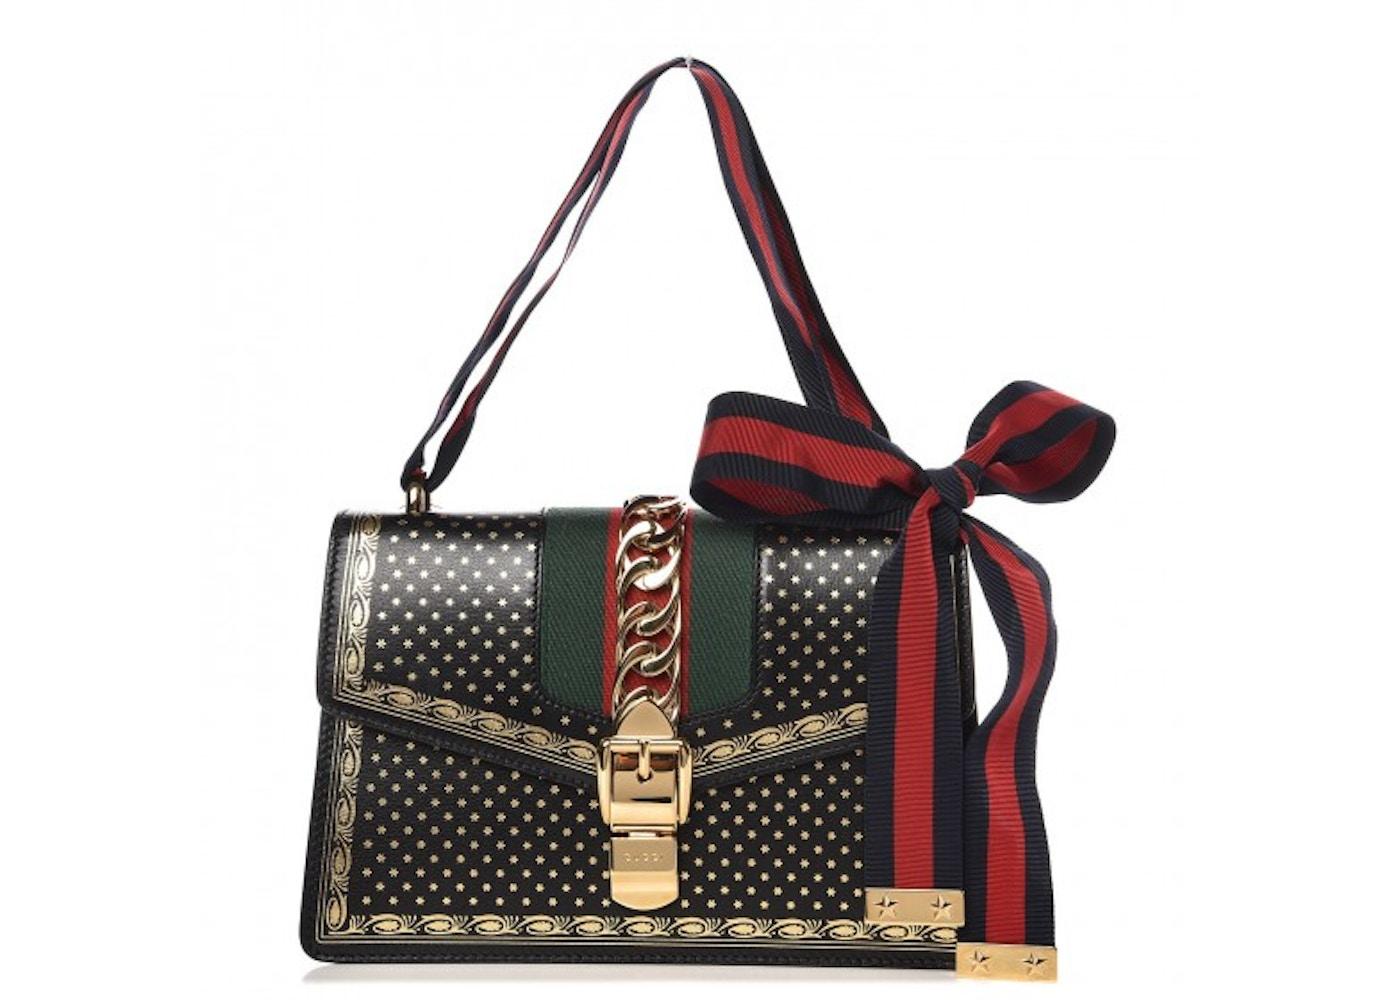 8cfed4b7ba6d Buy & Sell Gucci Handbags - Last Sale